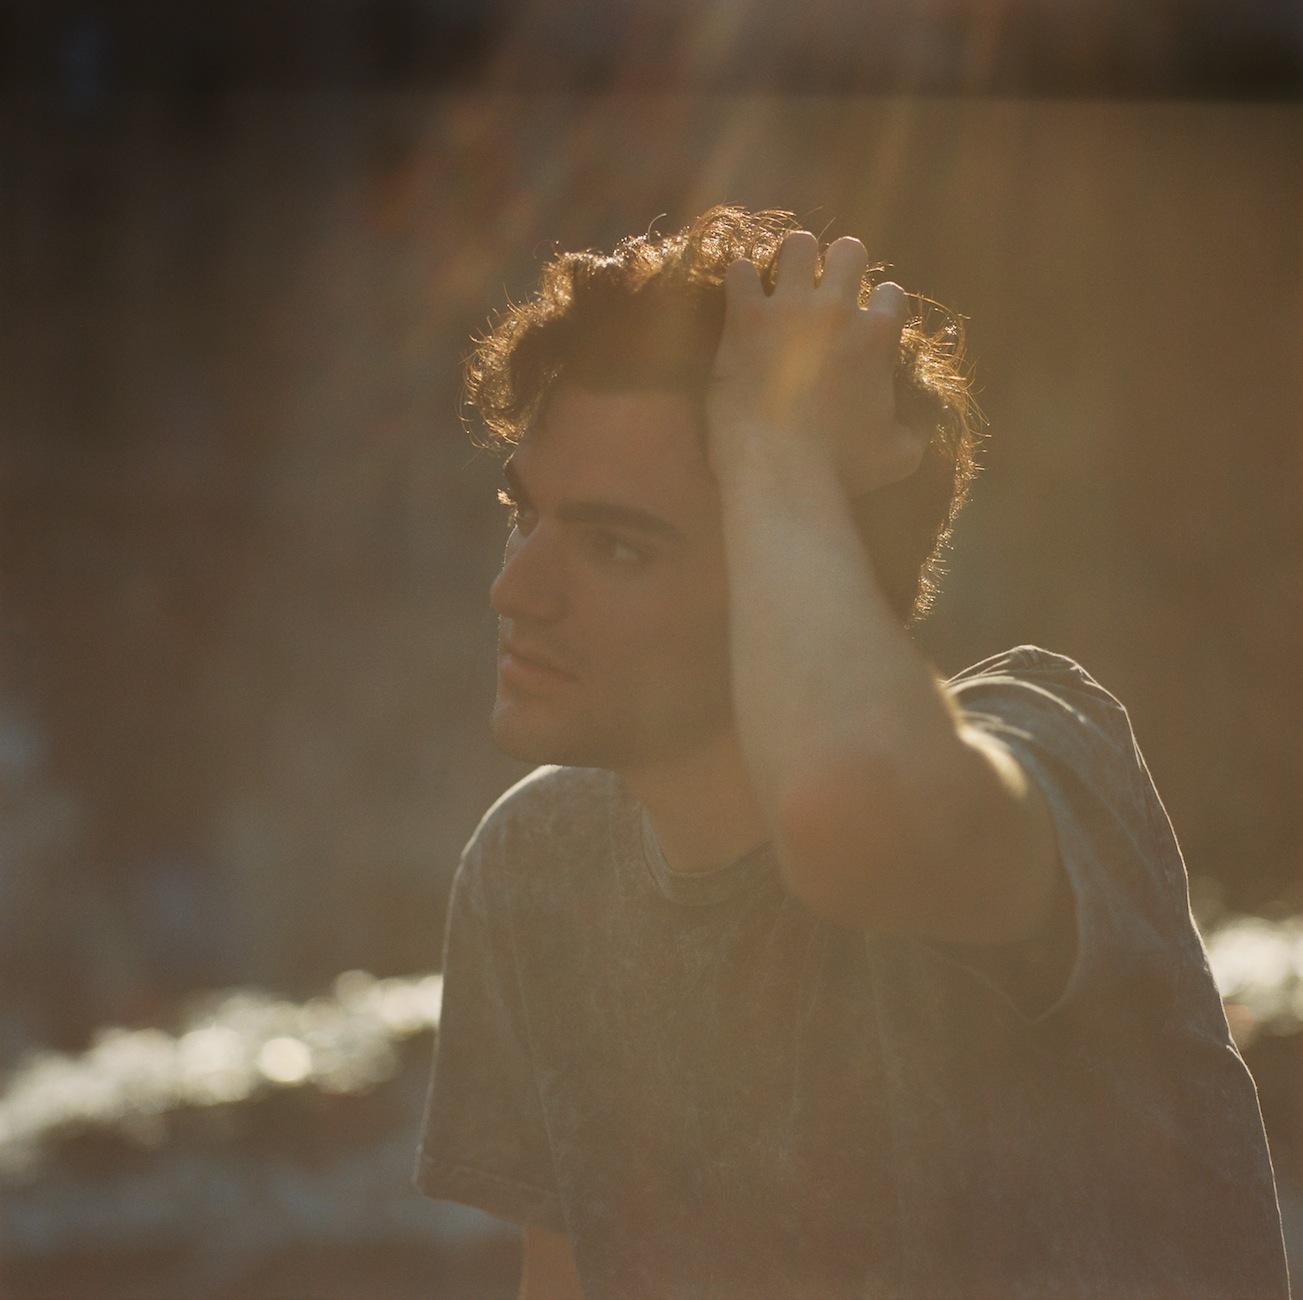 Photo by Yael Malka